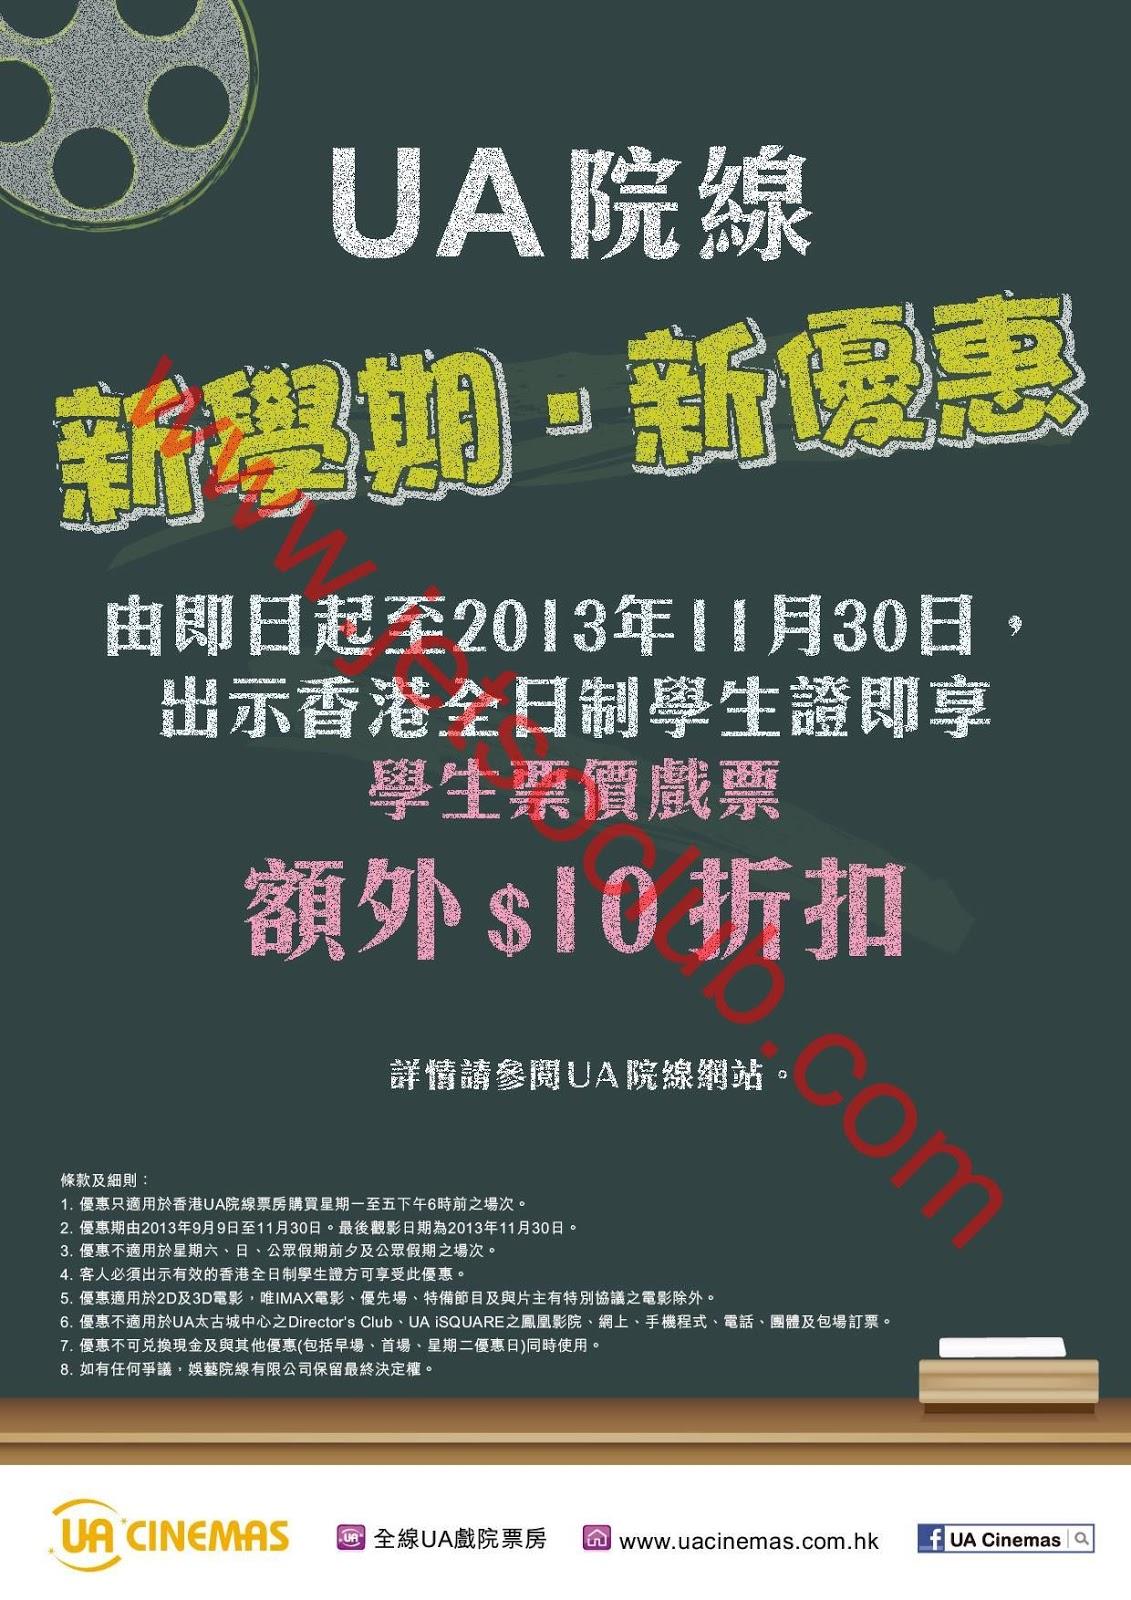 UA院線:學生票價戲票 額外$10折扣(至30/11) ( Jetso Club 著數俱樂部 )